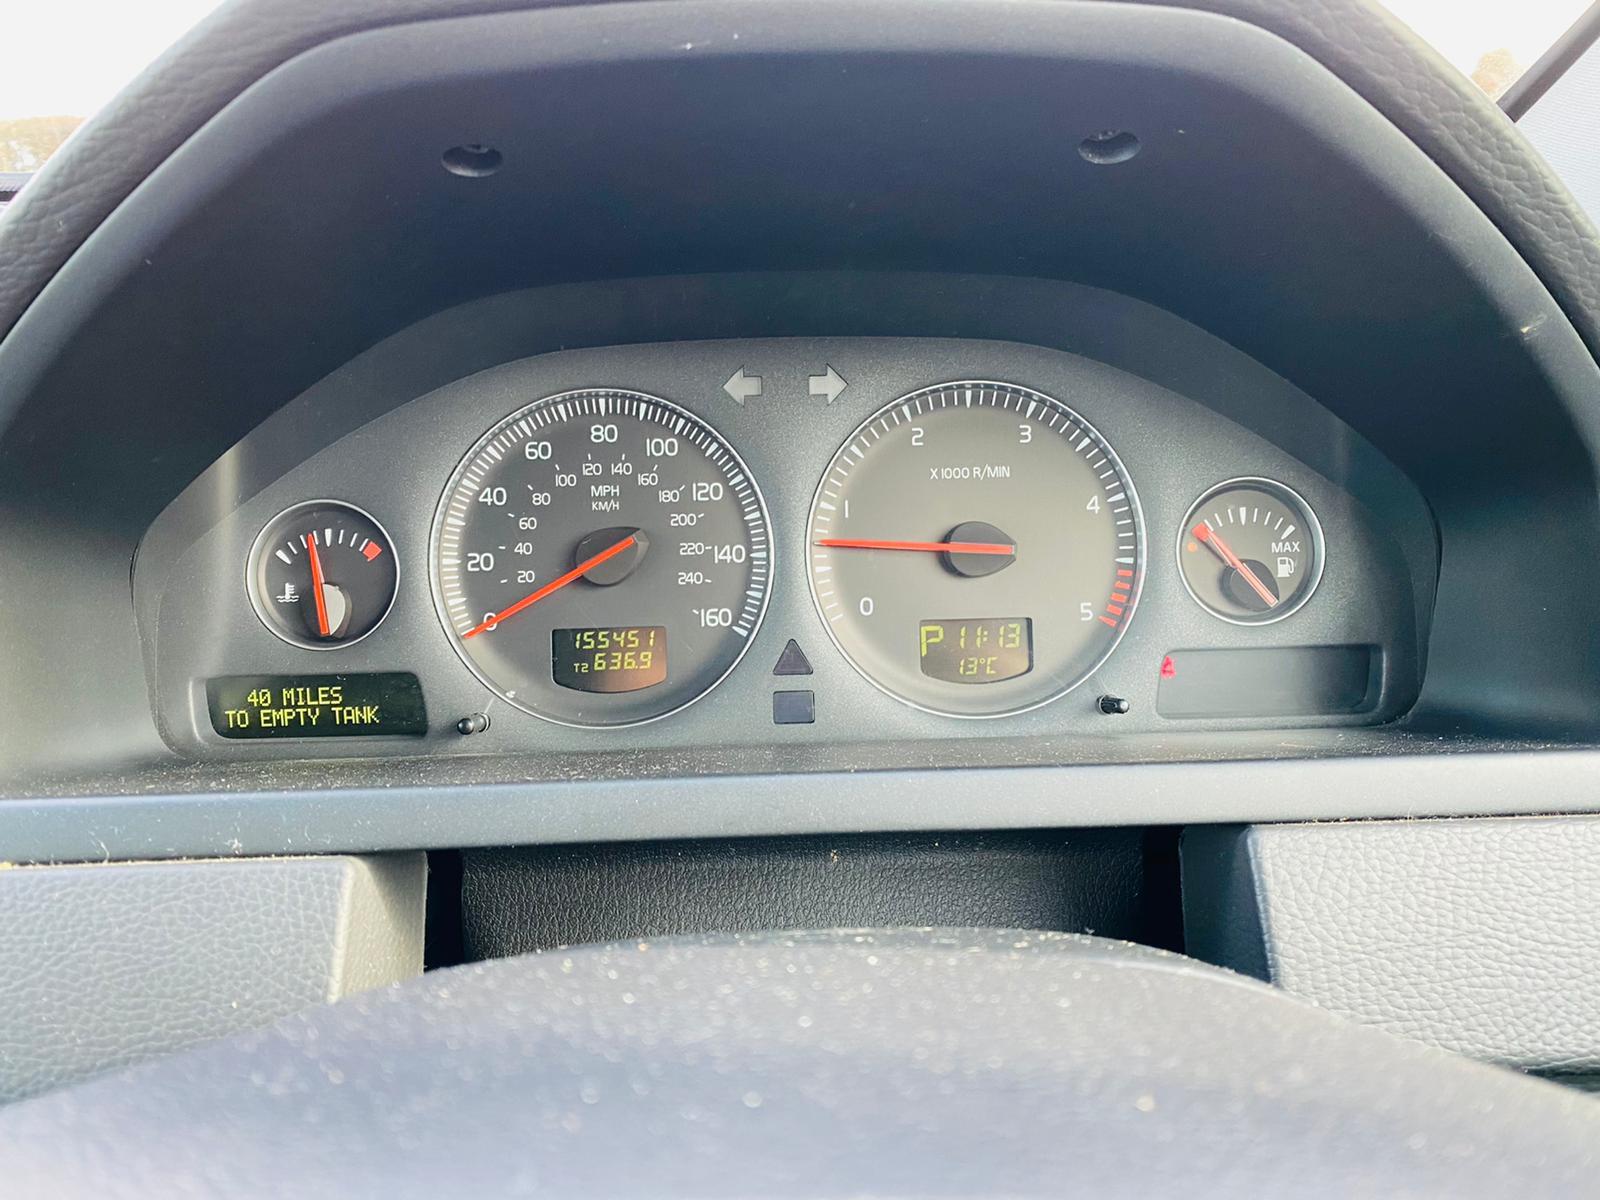 Volvo XC90 2.4 D5 185bhp SE Geartronic Auto 2006 06 Reg - 7 Seats - Air con - Top Spec - Image 47 of 47